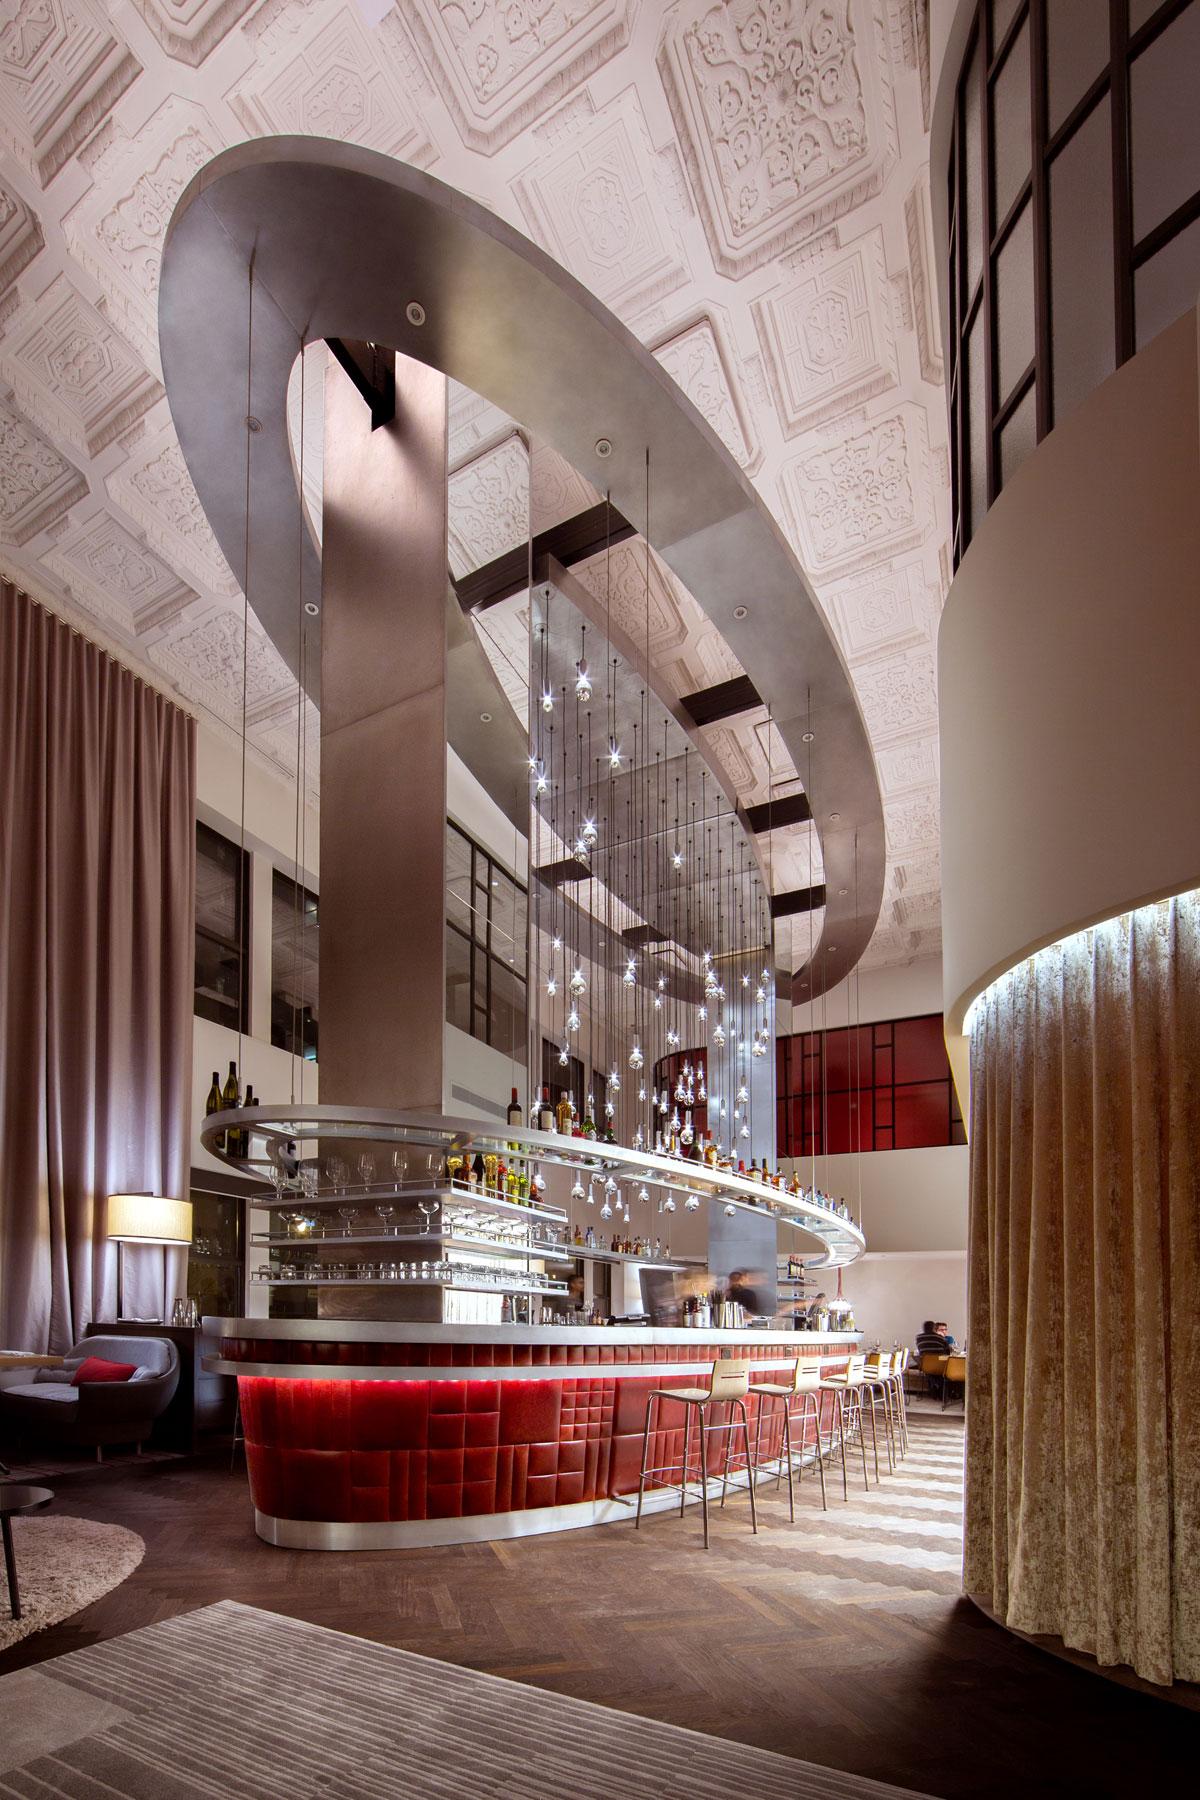 Richard Branson U0026 39 S First Virgin Hotel In Chicago Opened Its